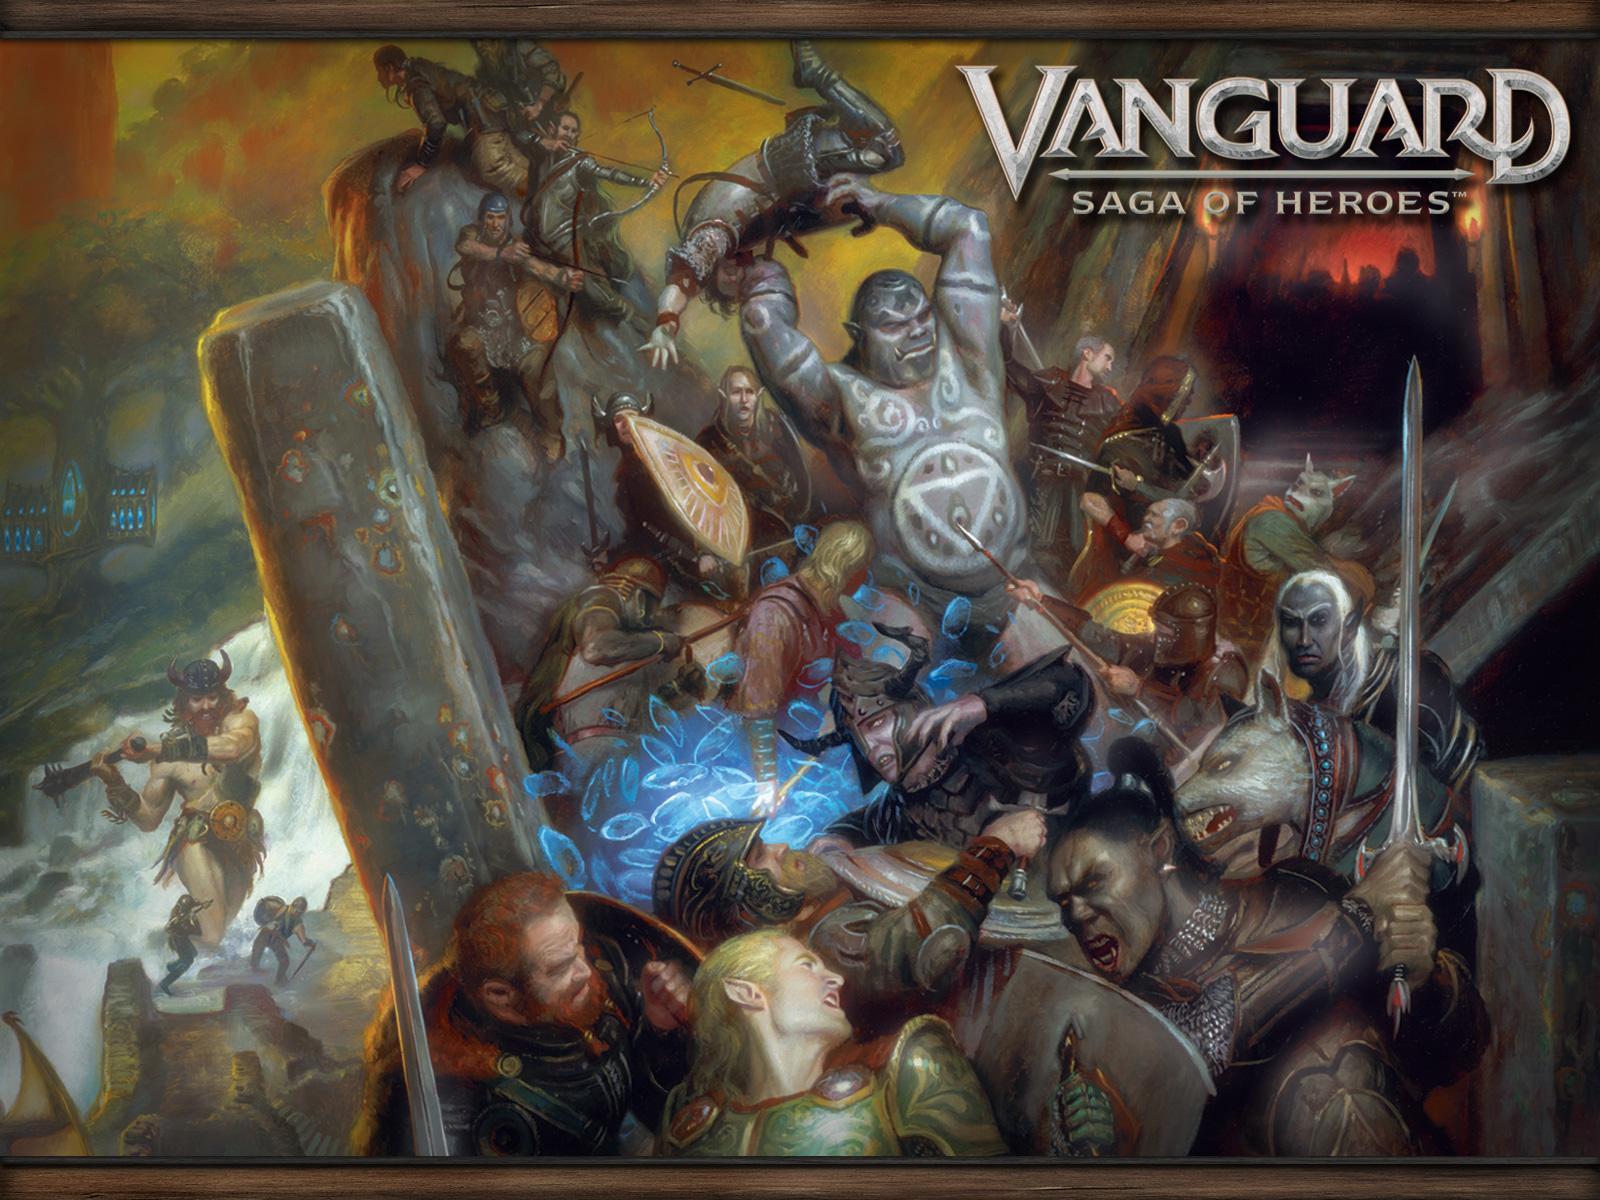 Vanguard saga of heroes nude mod sexy scene